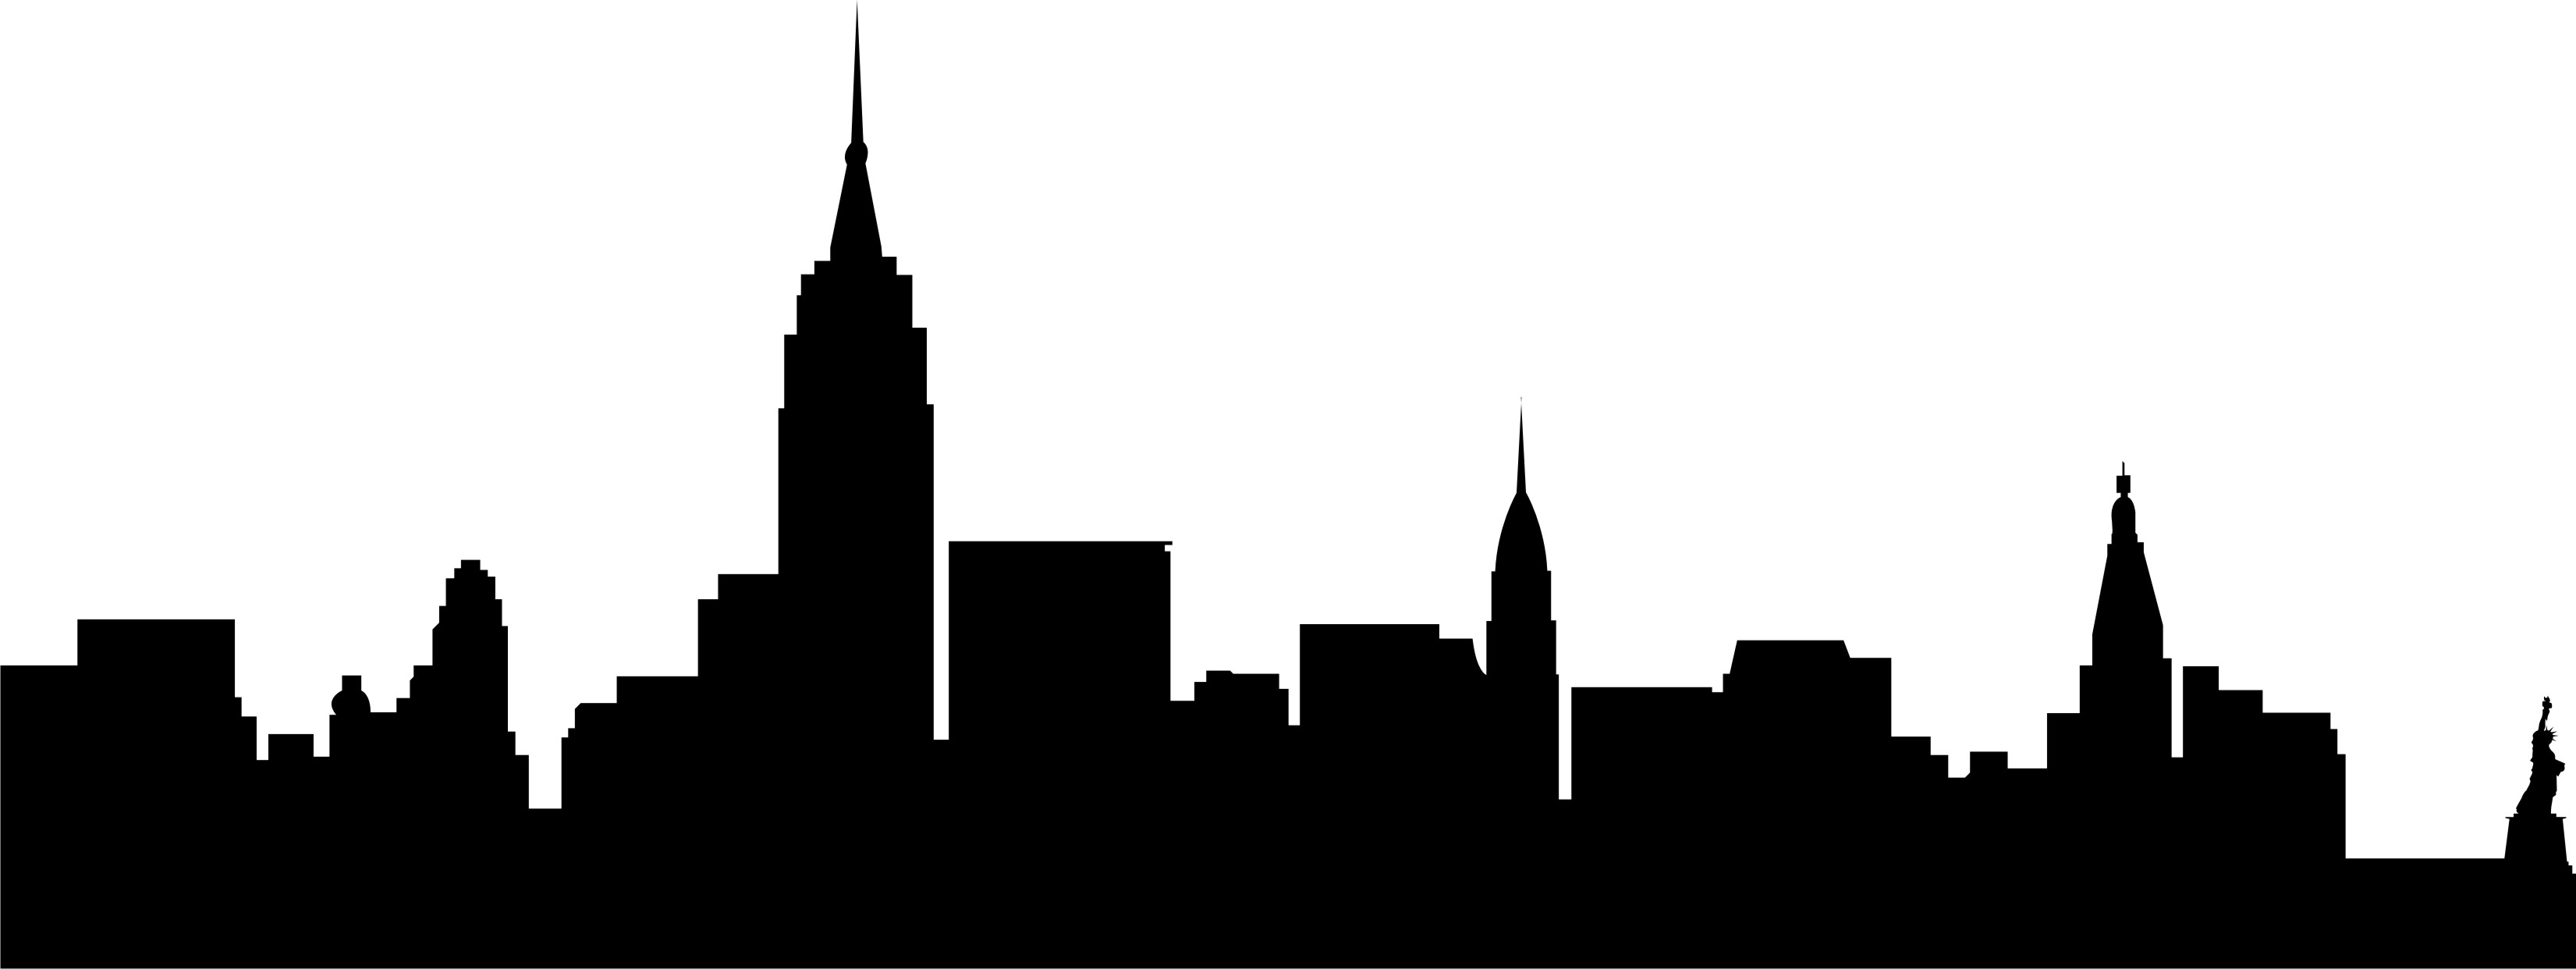 New York City Clipart - Blogsbeta